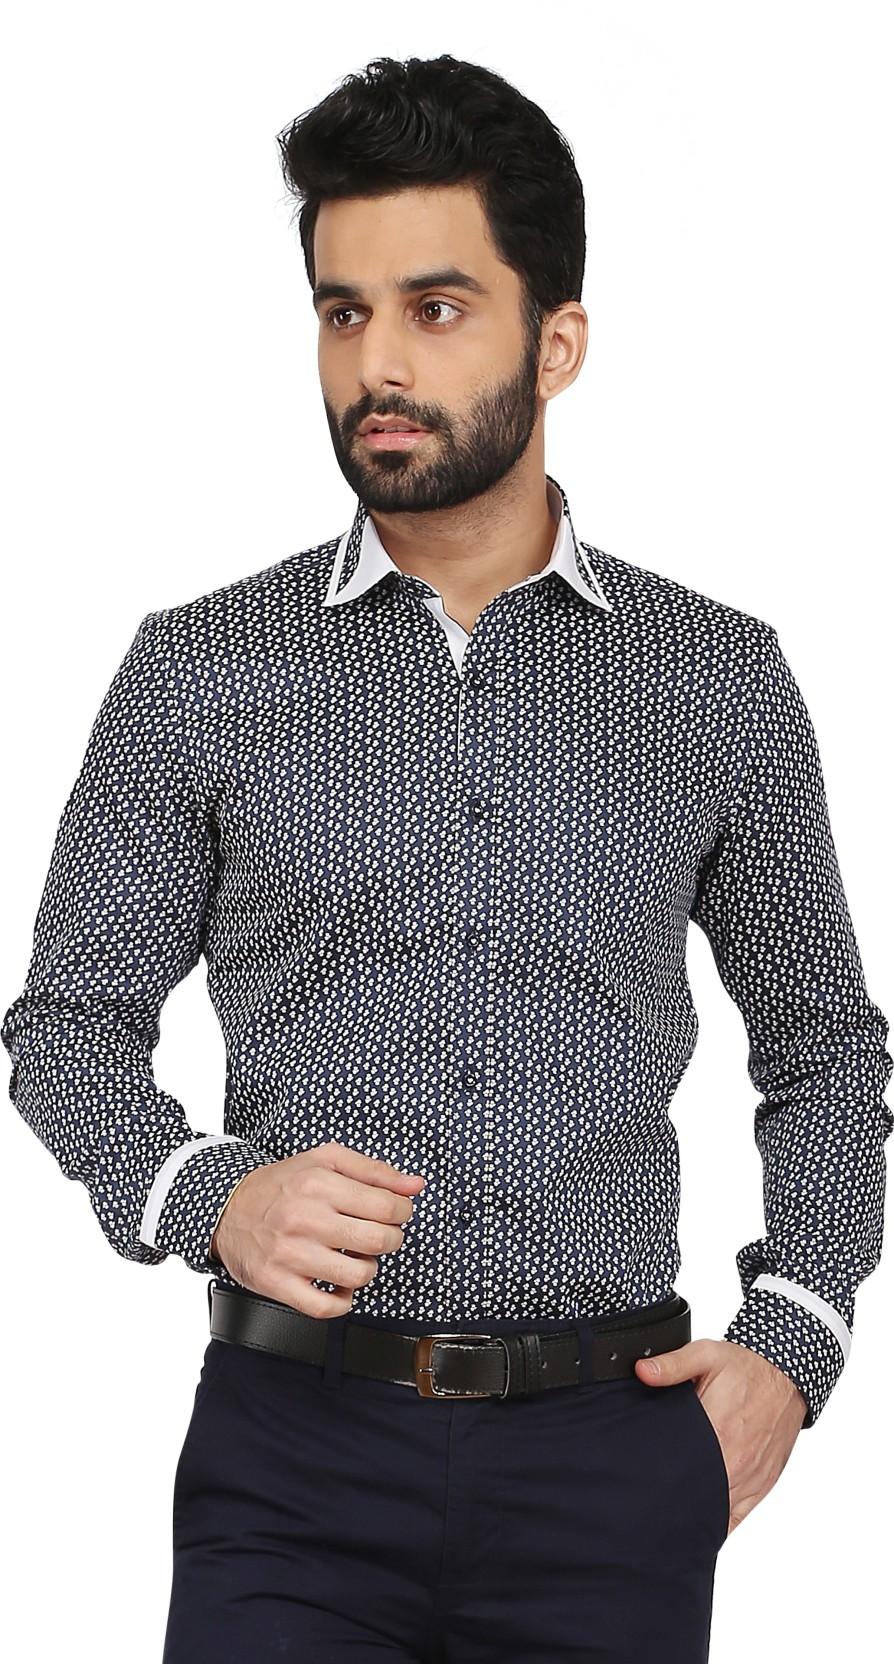 a9e2ebf846a5 Daagwood Men's Self Design Casual Shirt - Buy Daagwood Men's Self ...